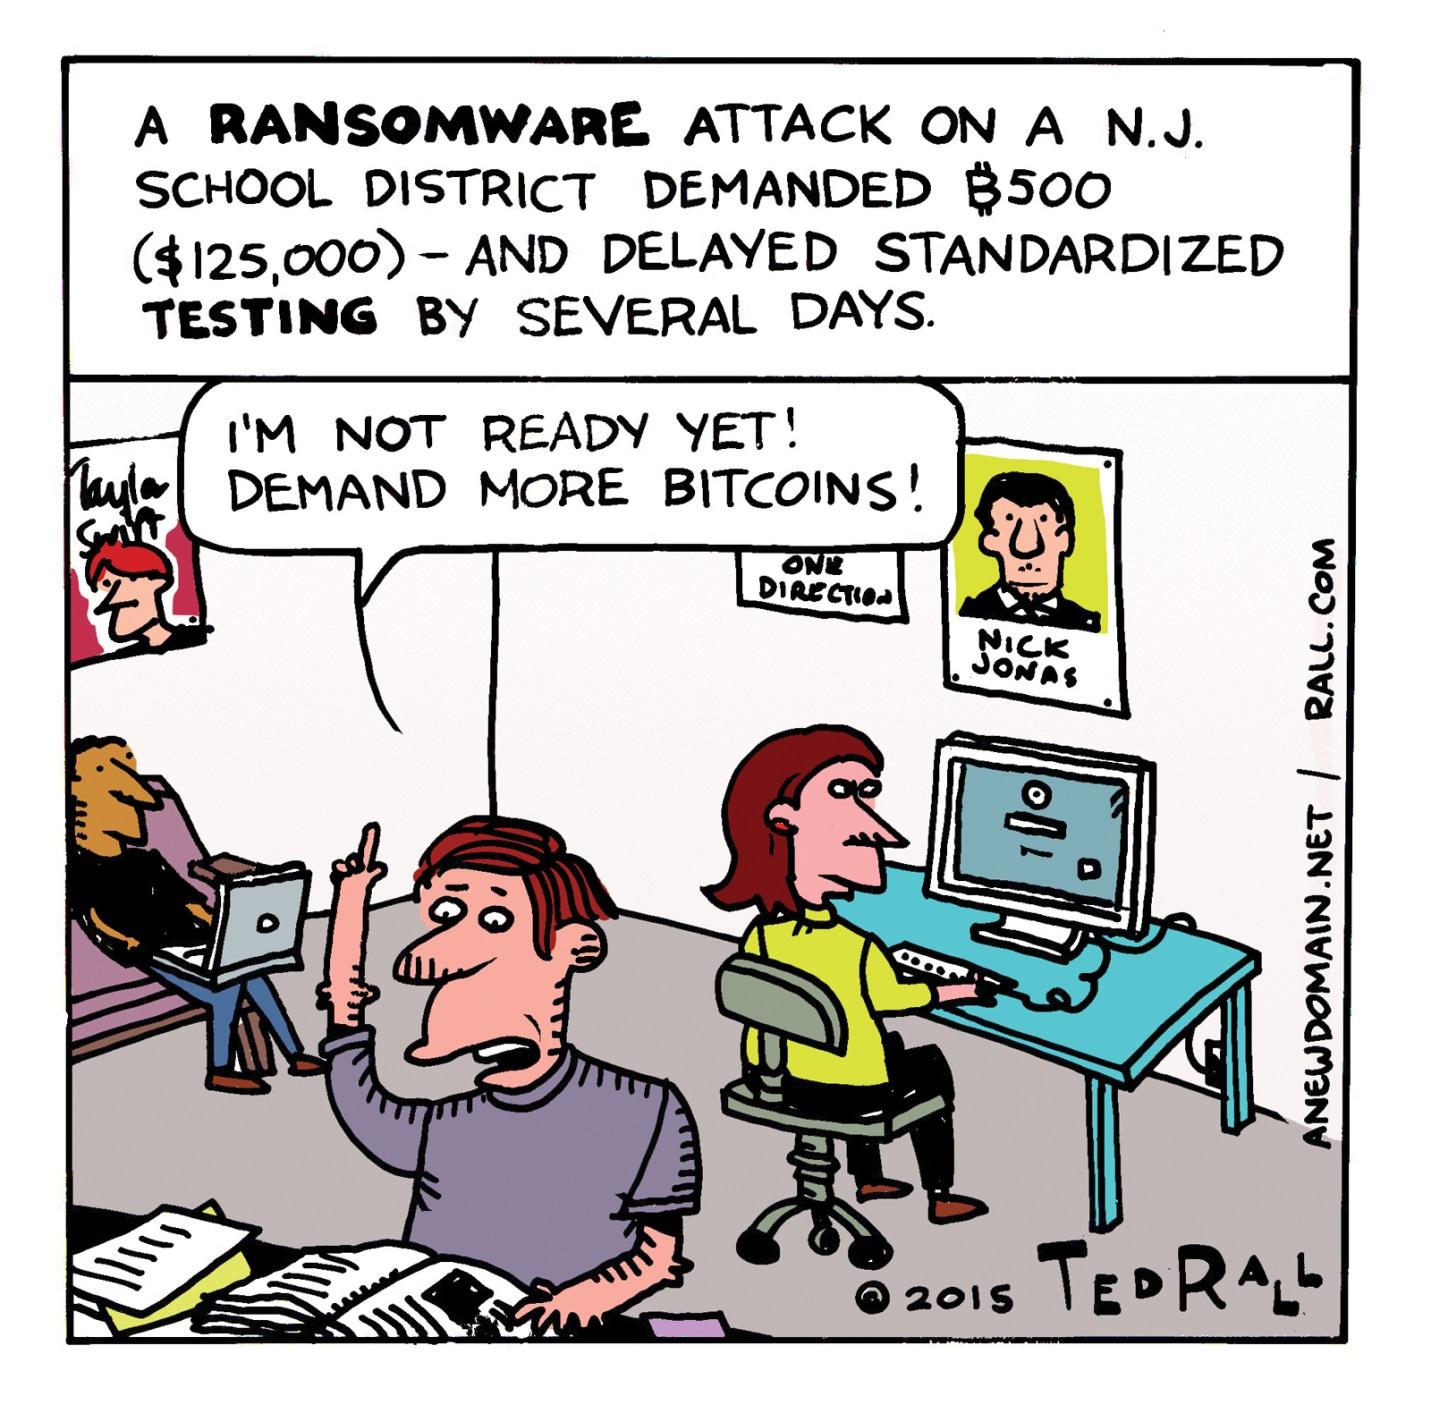 ransomware attack on school